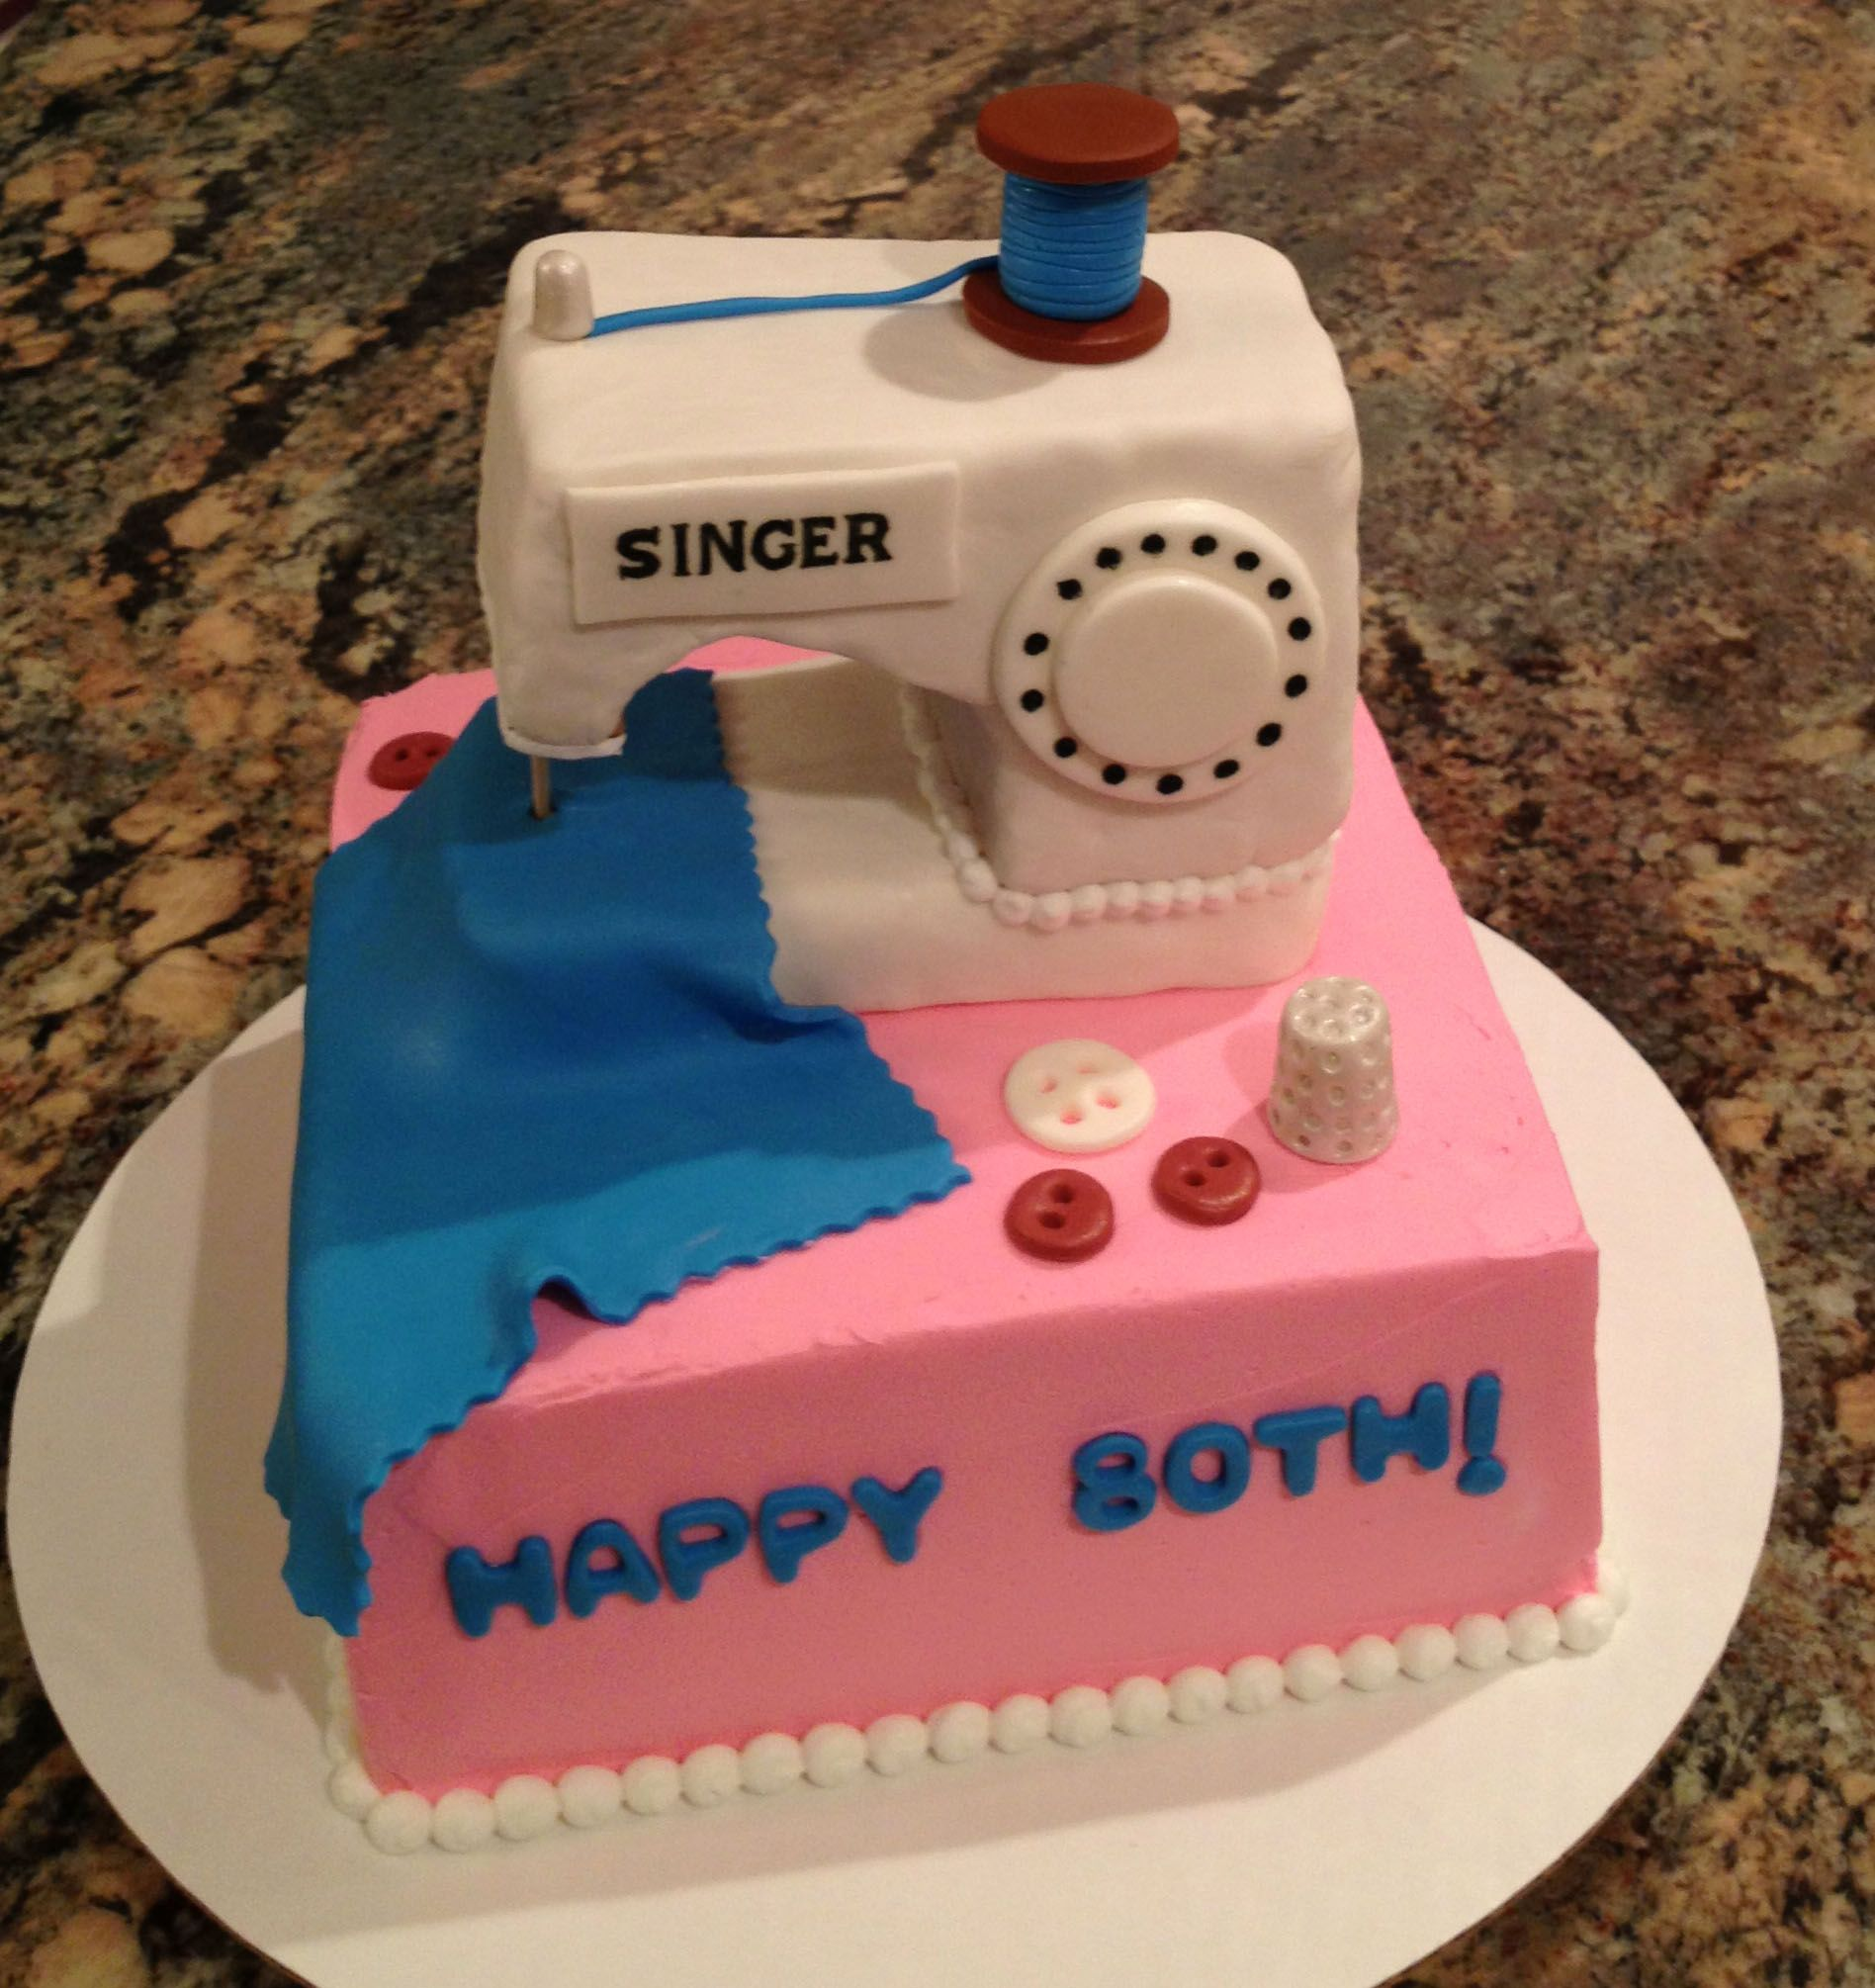 Sewing Machine Cake | CakesbyLynn | Pinterest